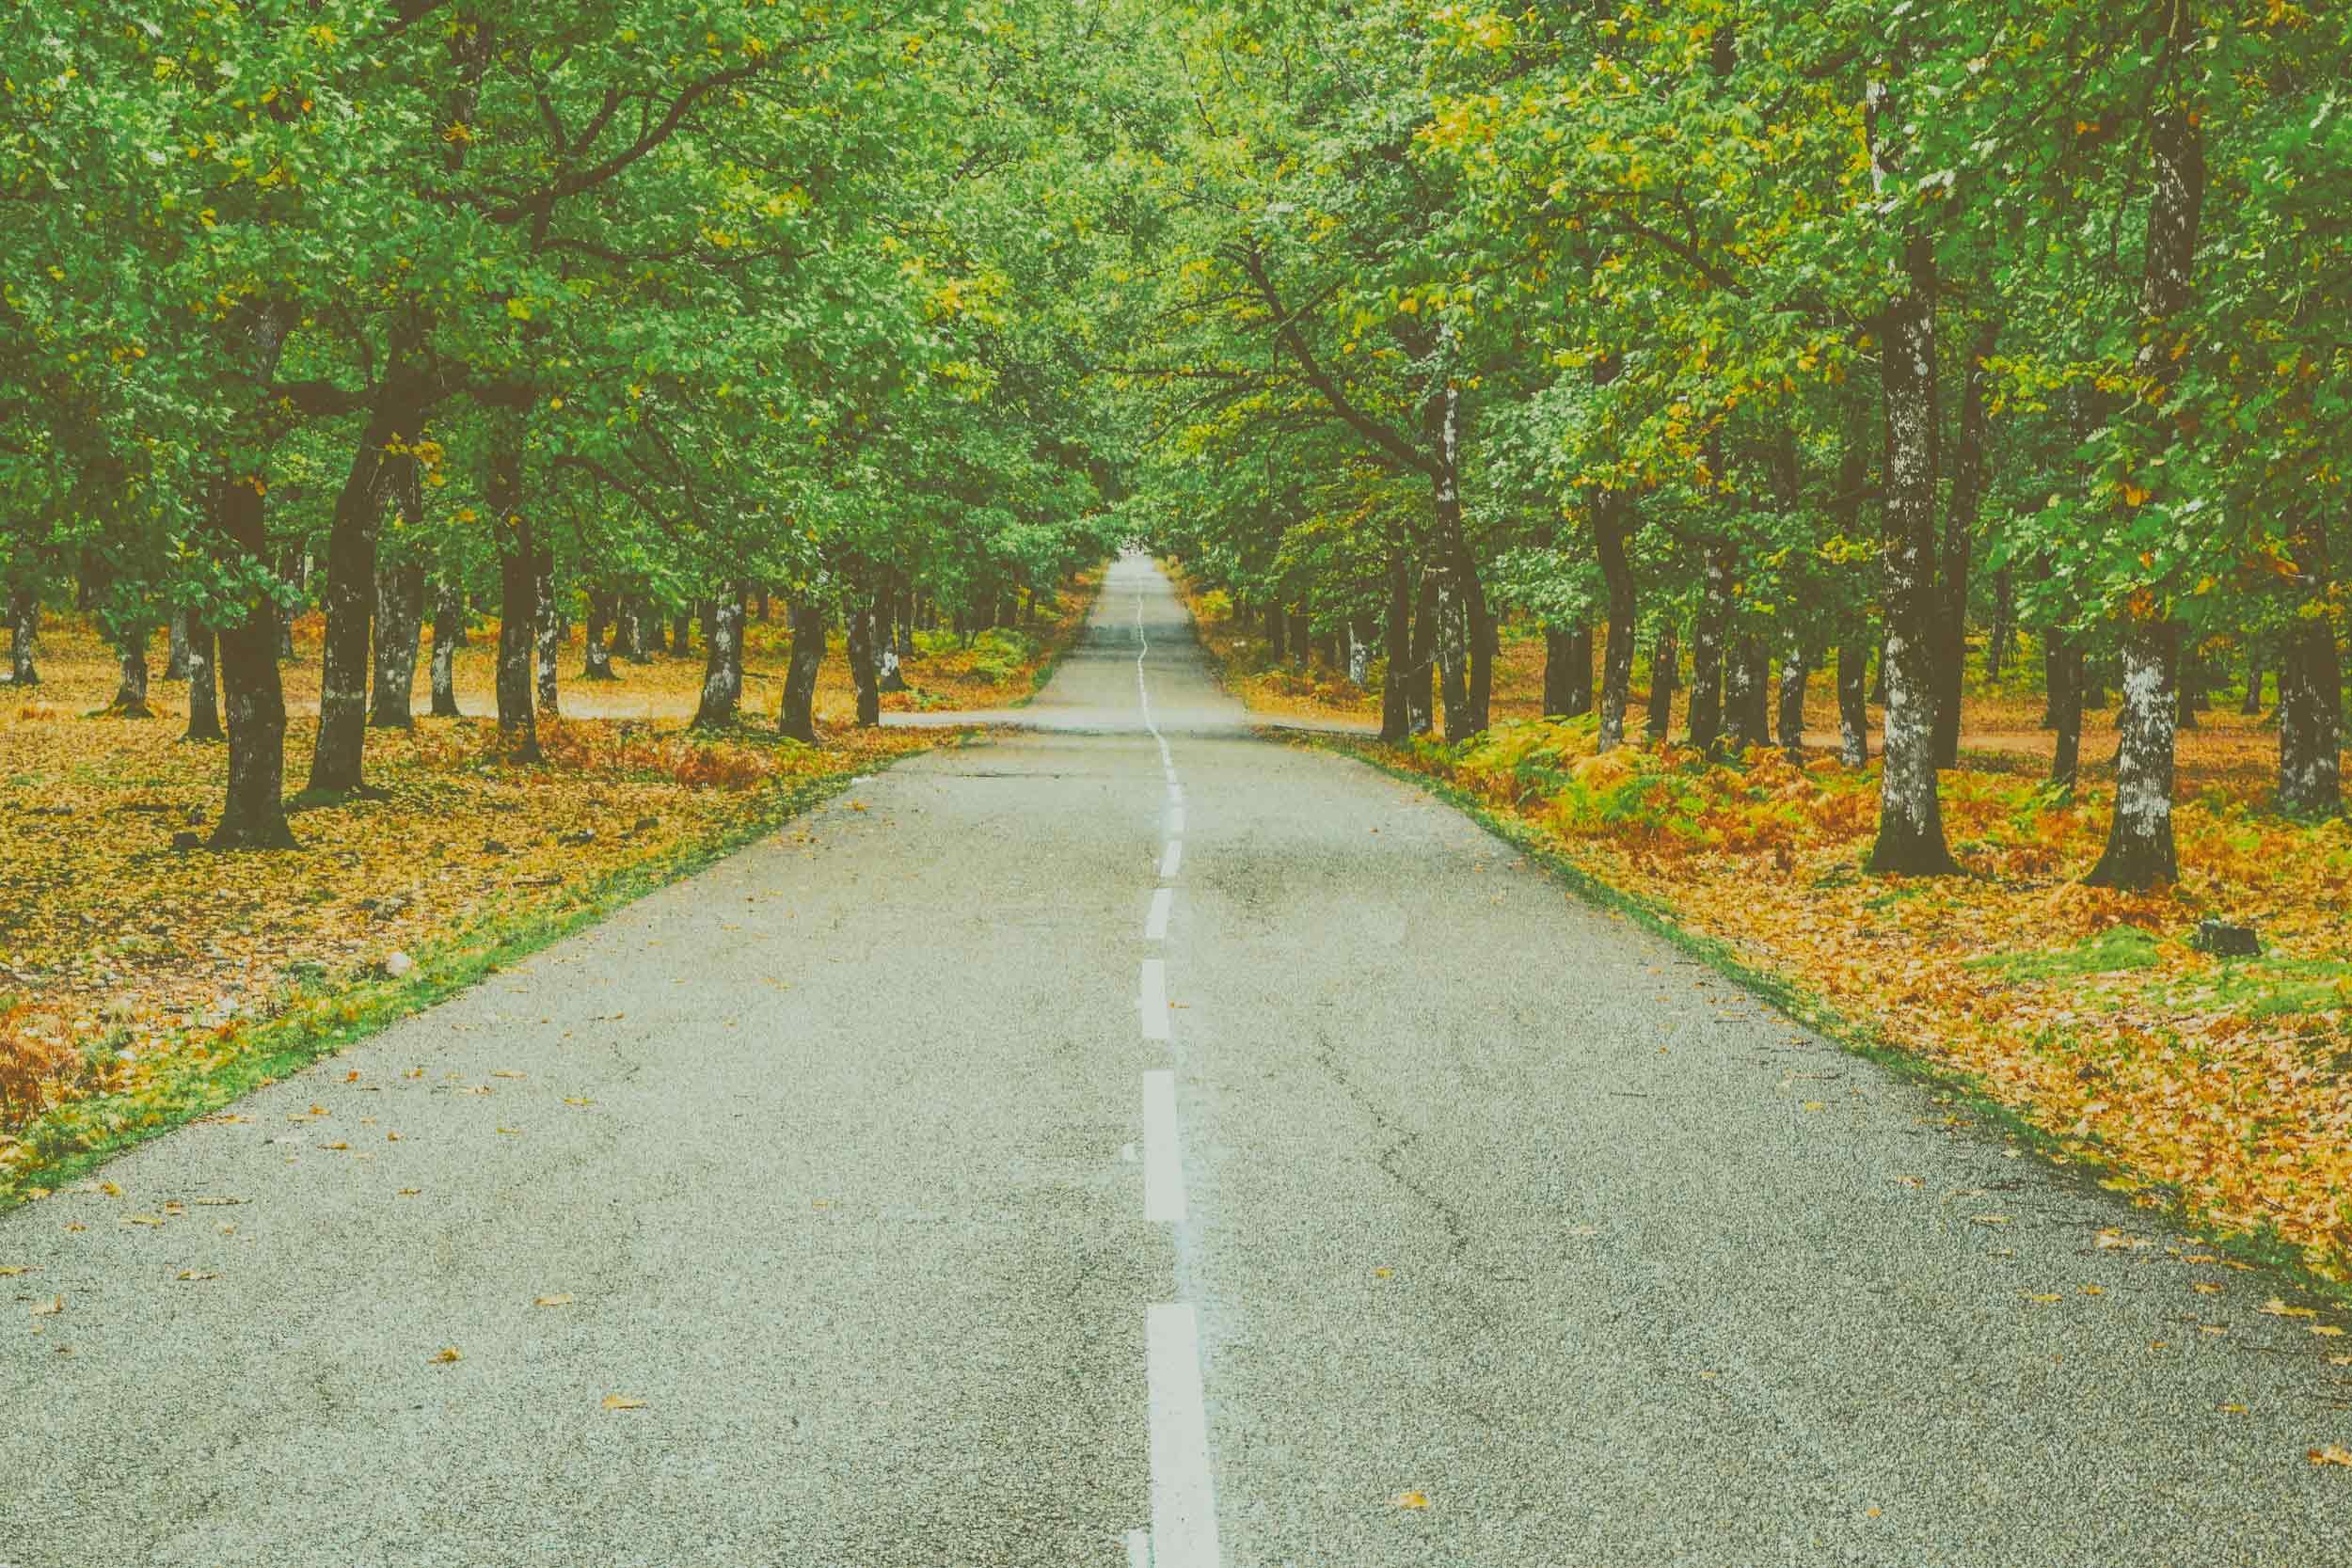 asphalt-dry-leaves-environment-694444.jpg